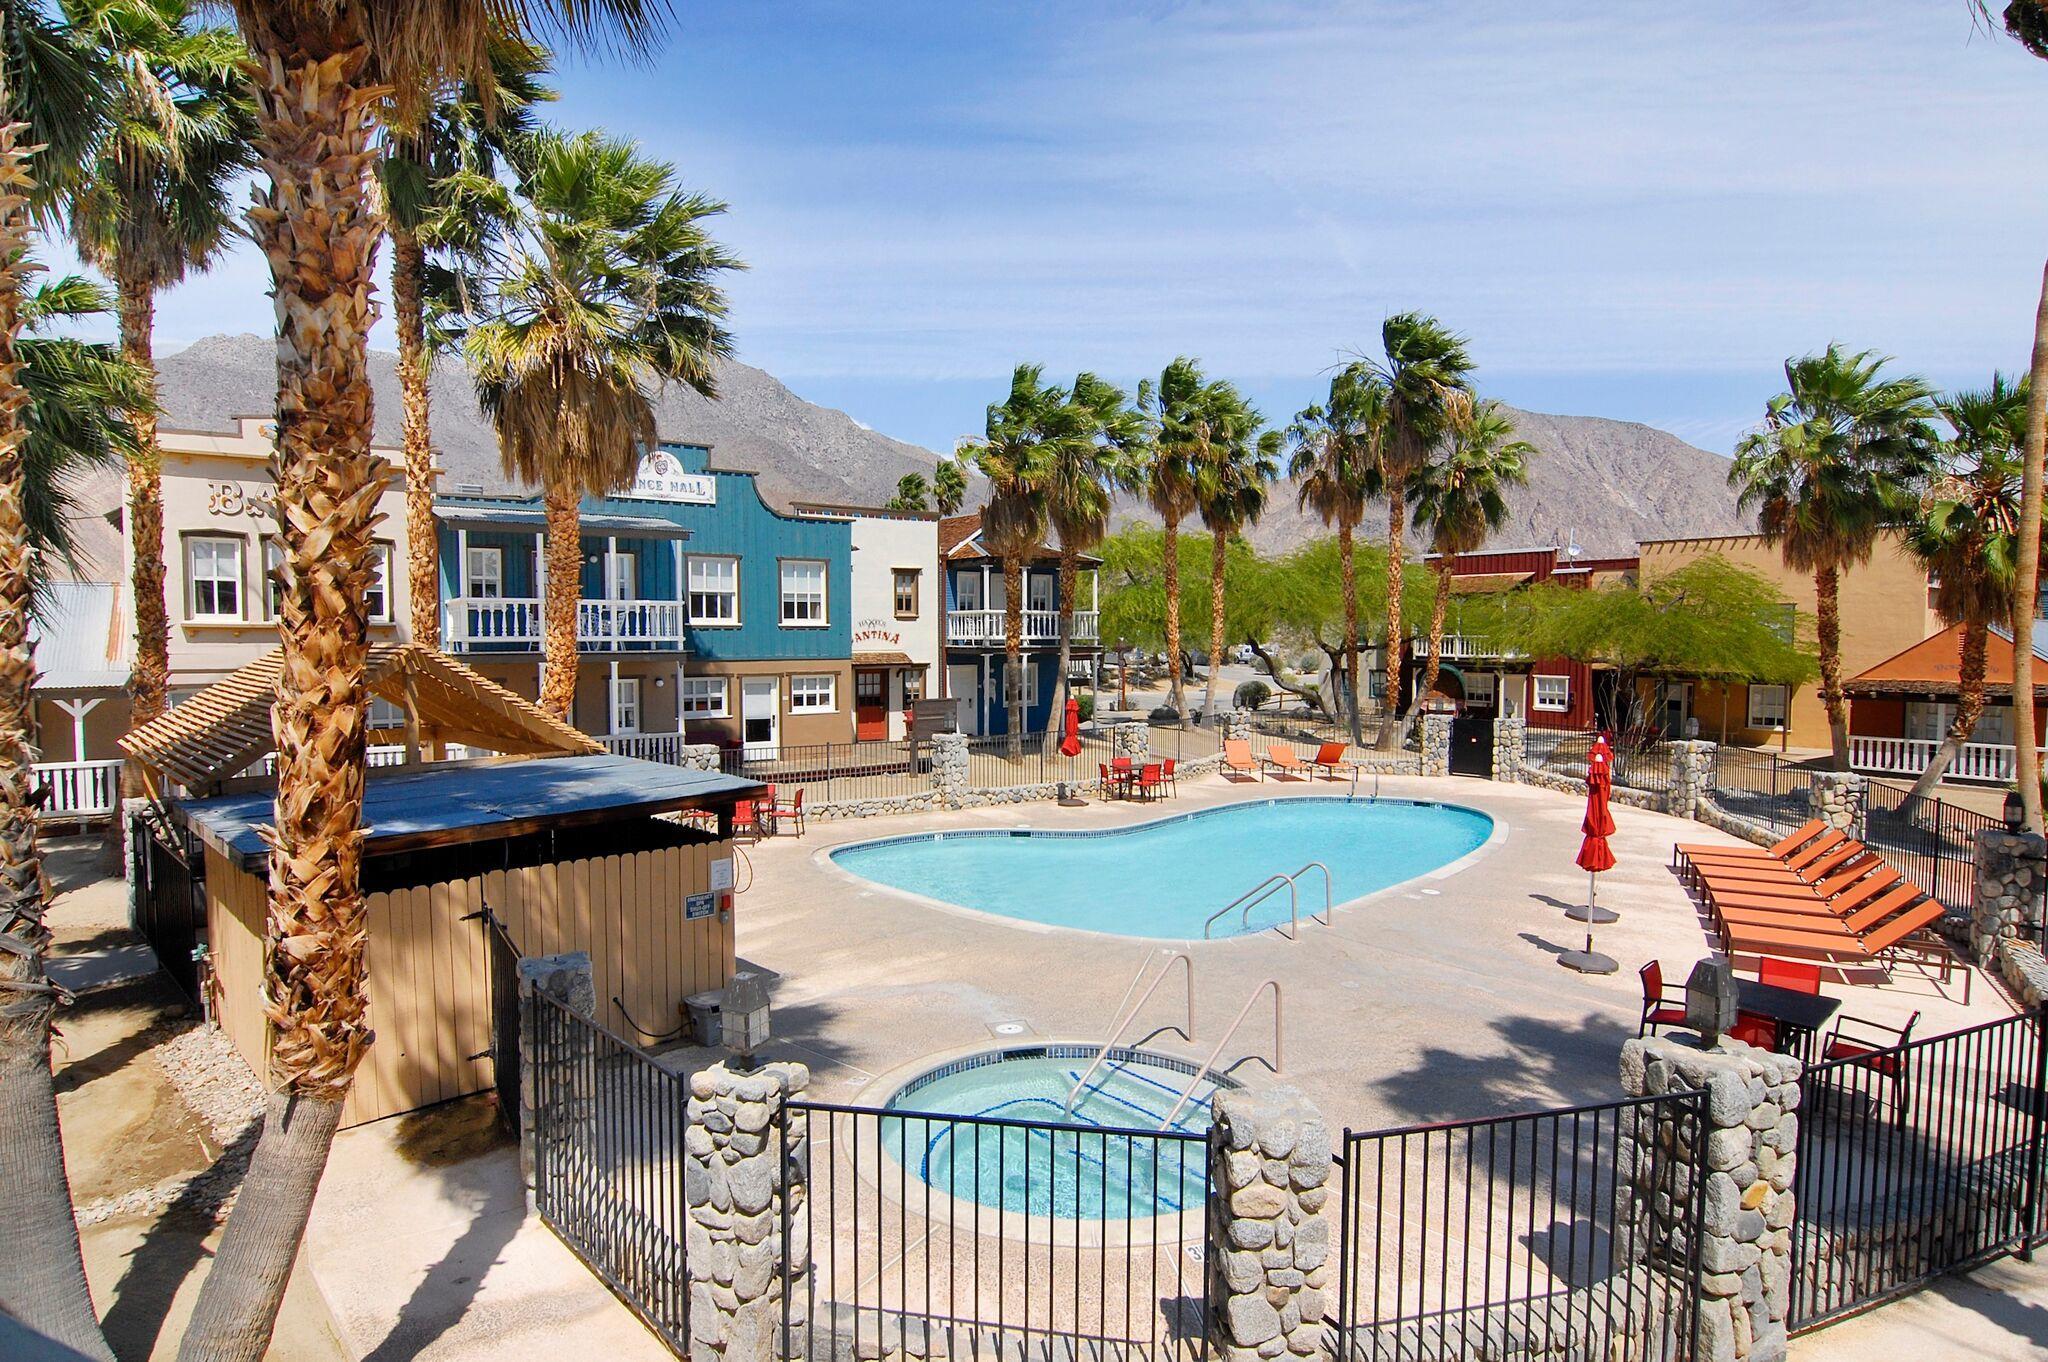 Palm Canyon Hotel Amp Rv Resort Borrego Springs California